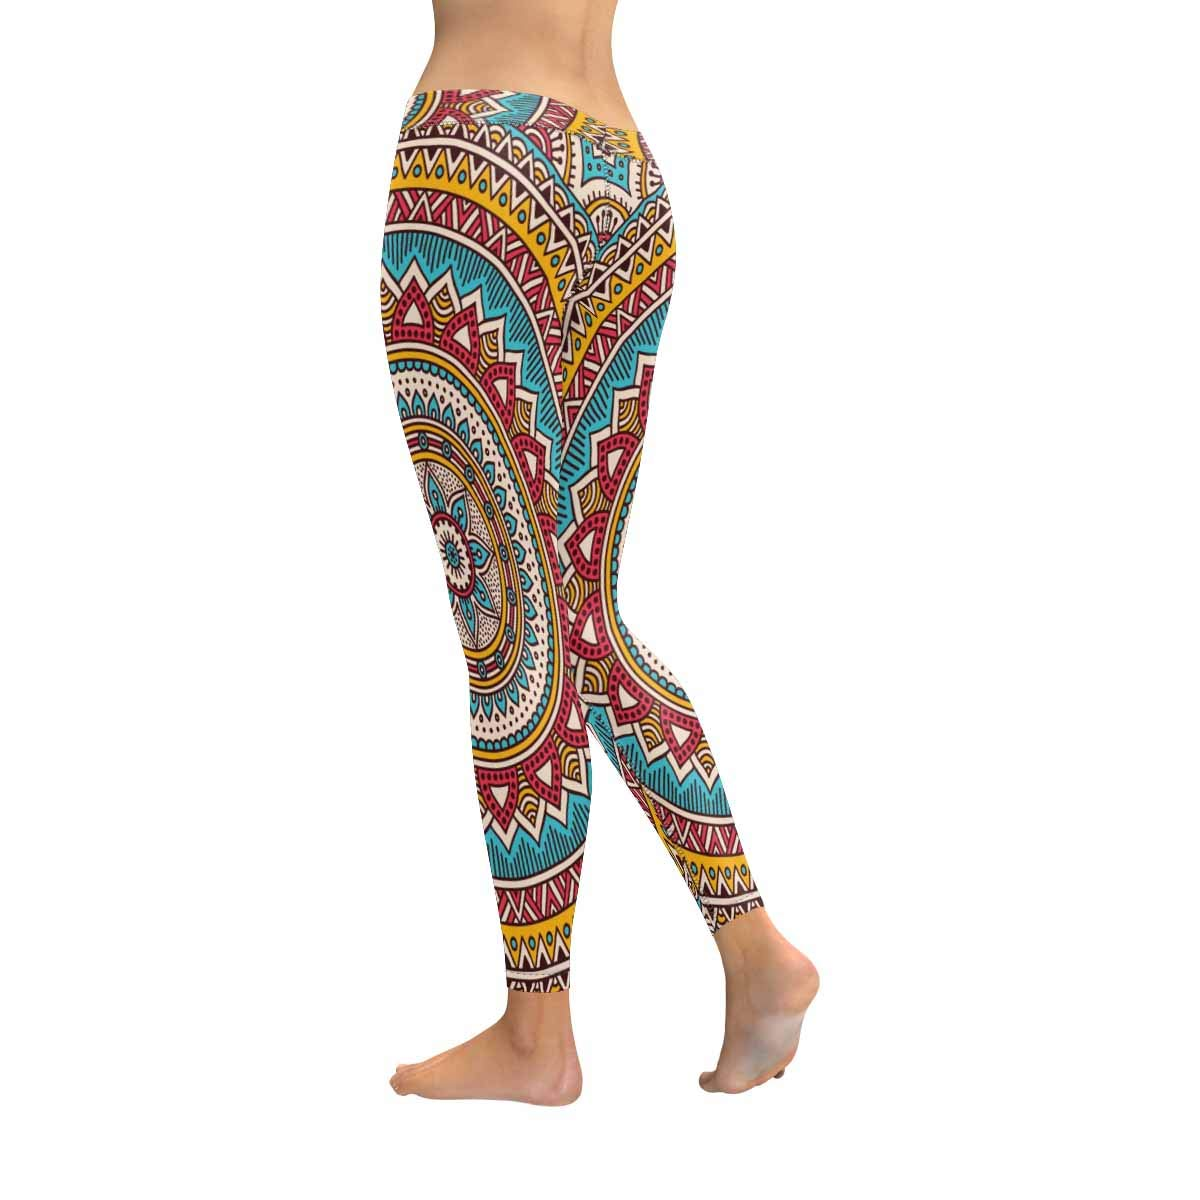 XXS-5XL InterestPrint Womens Soft Slim Leggings Mandala Vintage Running Workout Active Leggings